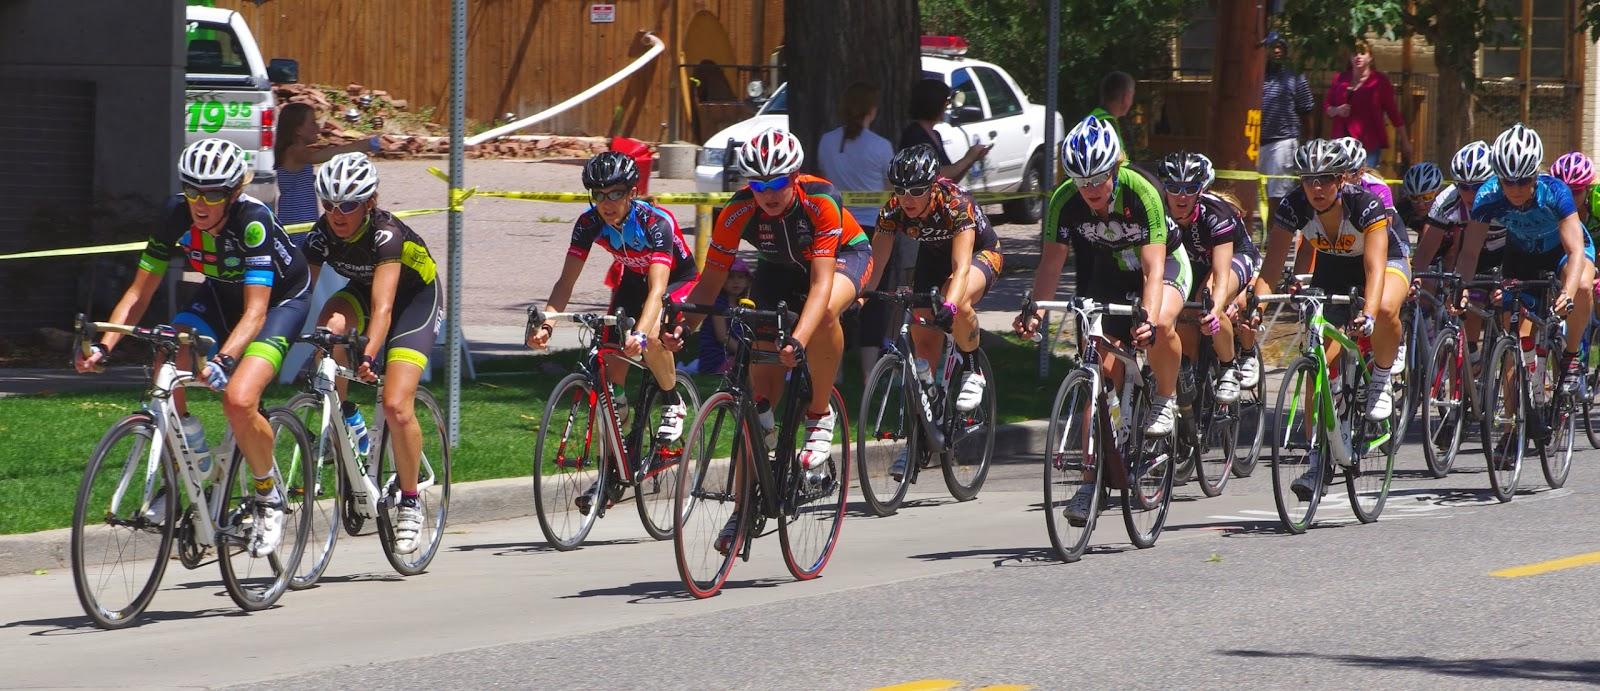 Bike Colorado 2014 Photo by Karen Rakestraw of